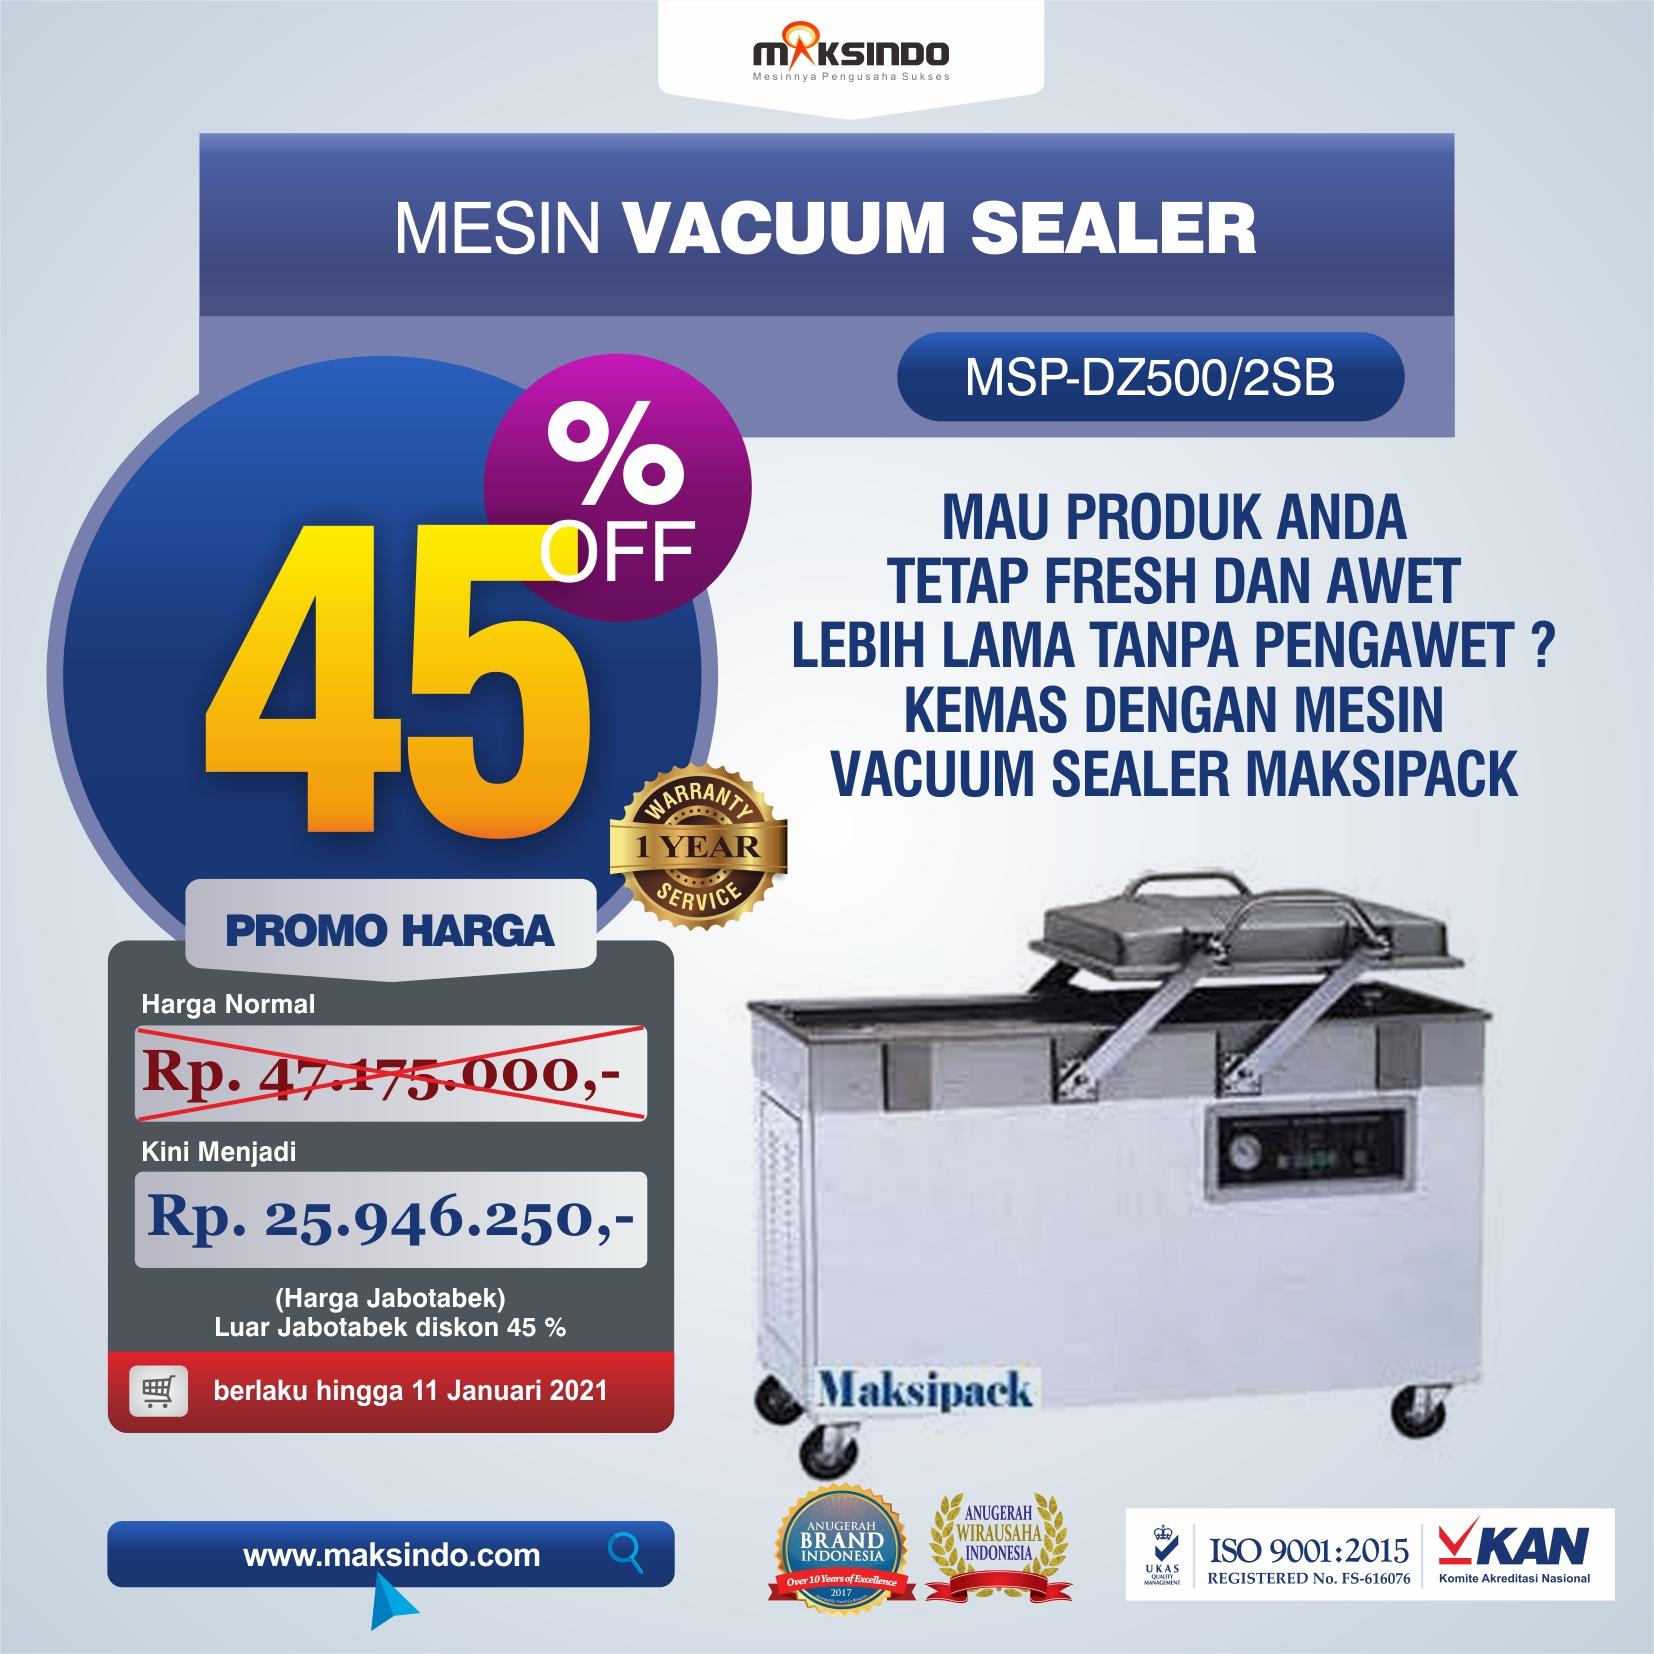 Jual Mesin Vacuum Sealer (DZ500/2SB) Di Semarang